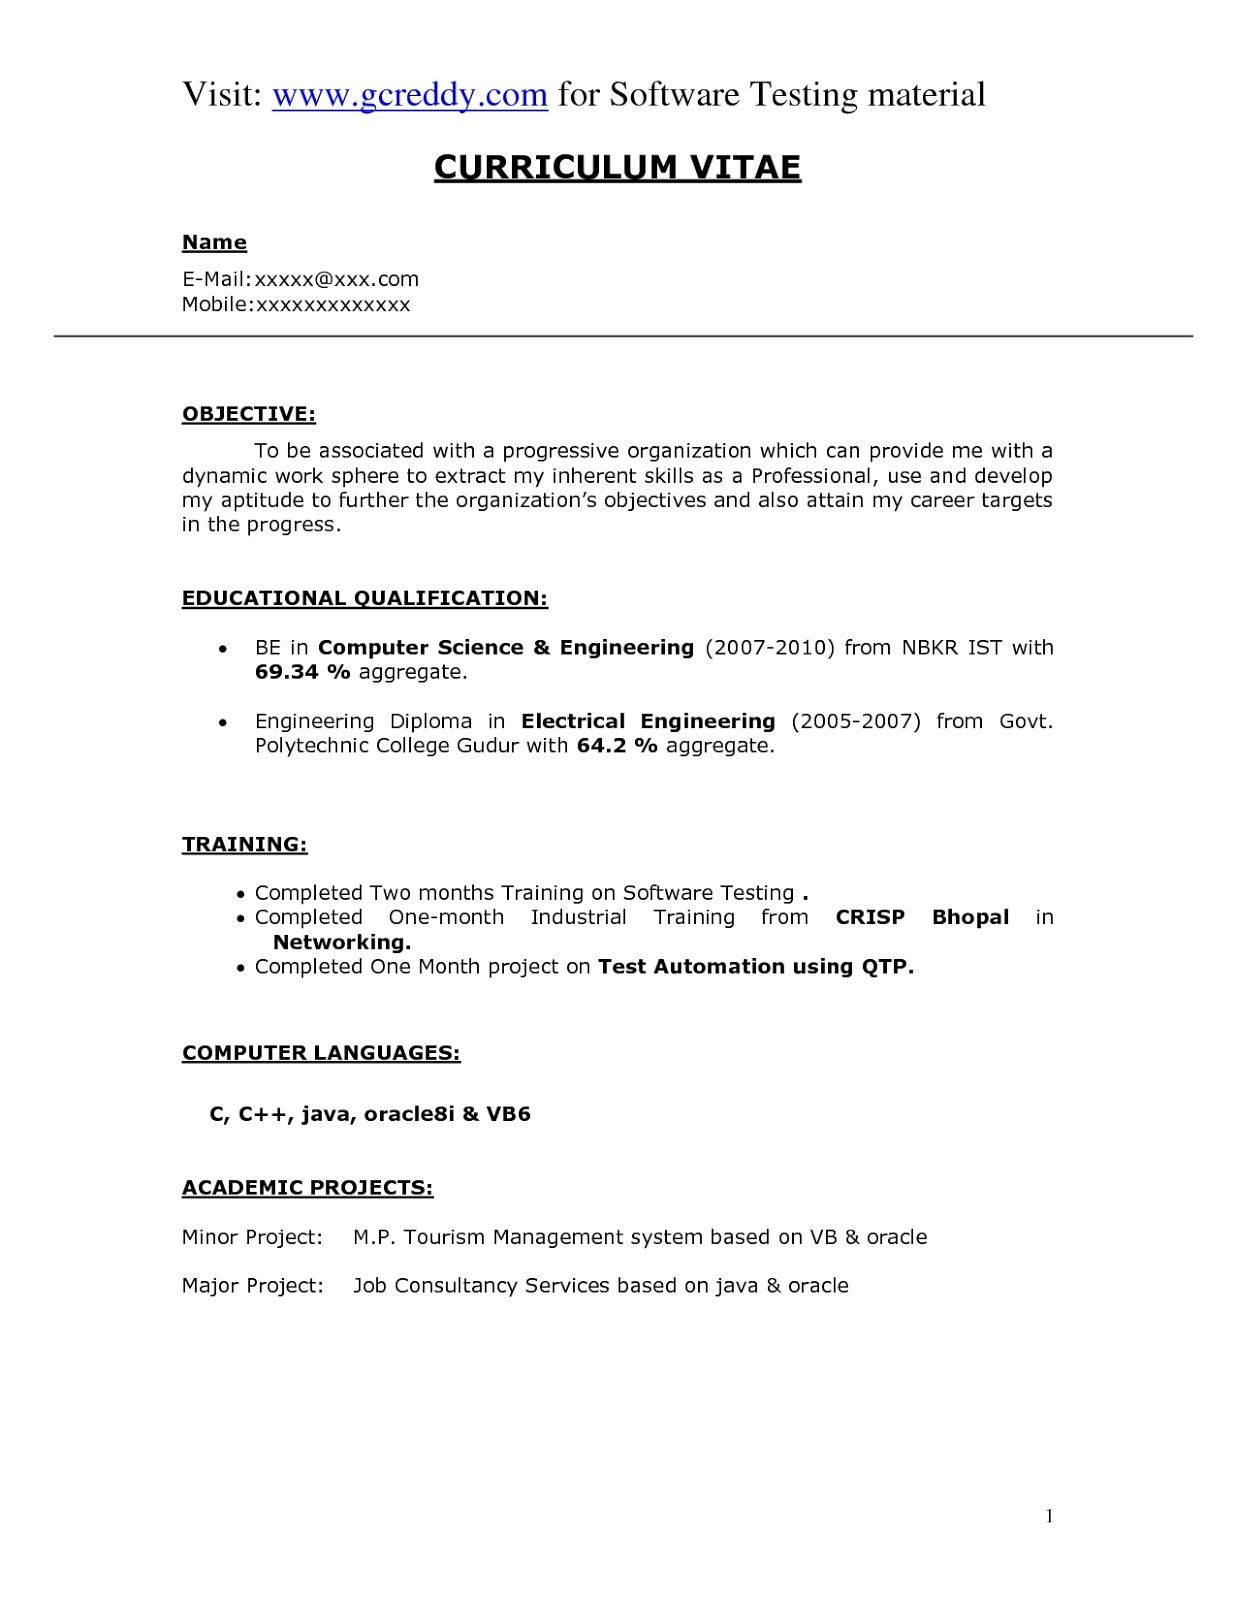 Basketball Player Resume 2019 Professional Basketball Player Resume Templates 2020 Basketball Player Resume Exampl Cover Letter For Resume Resume Format Resume